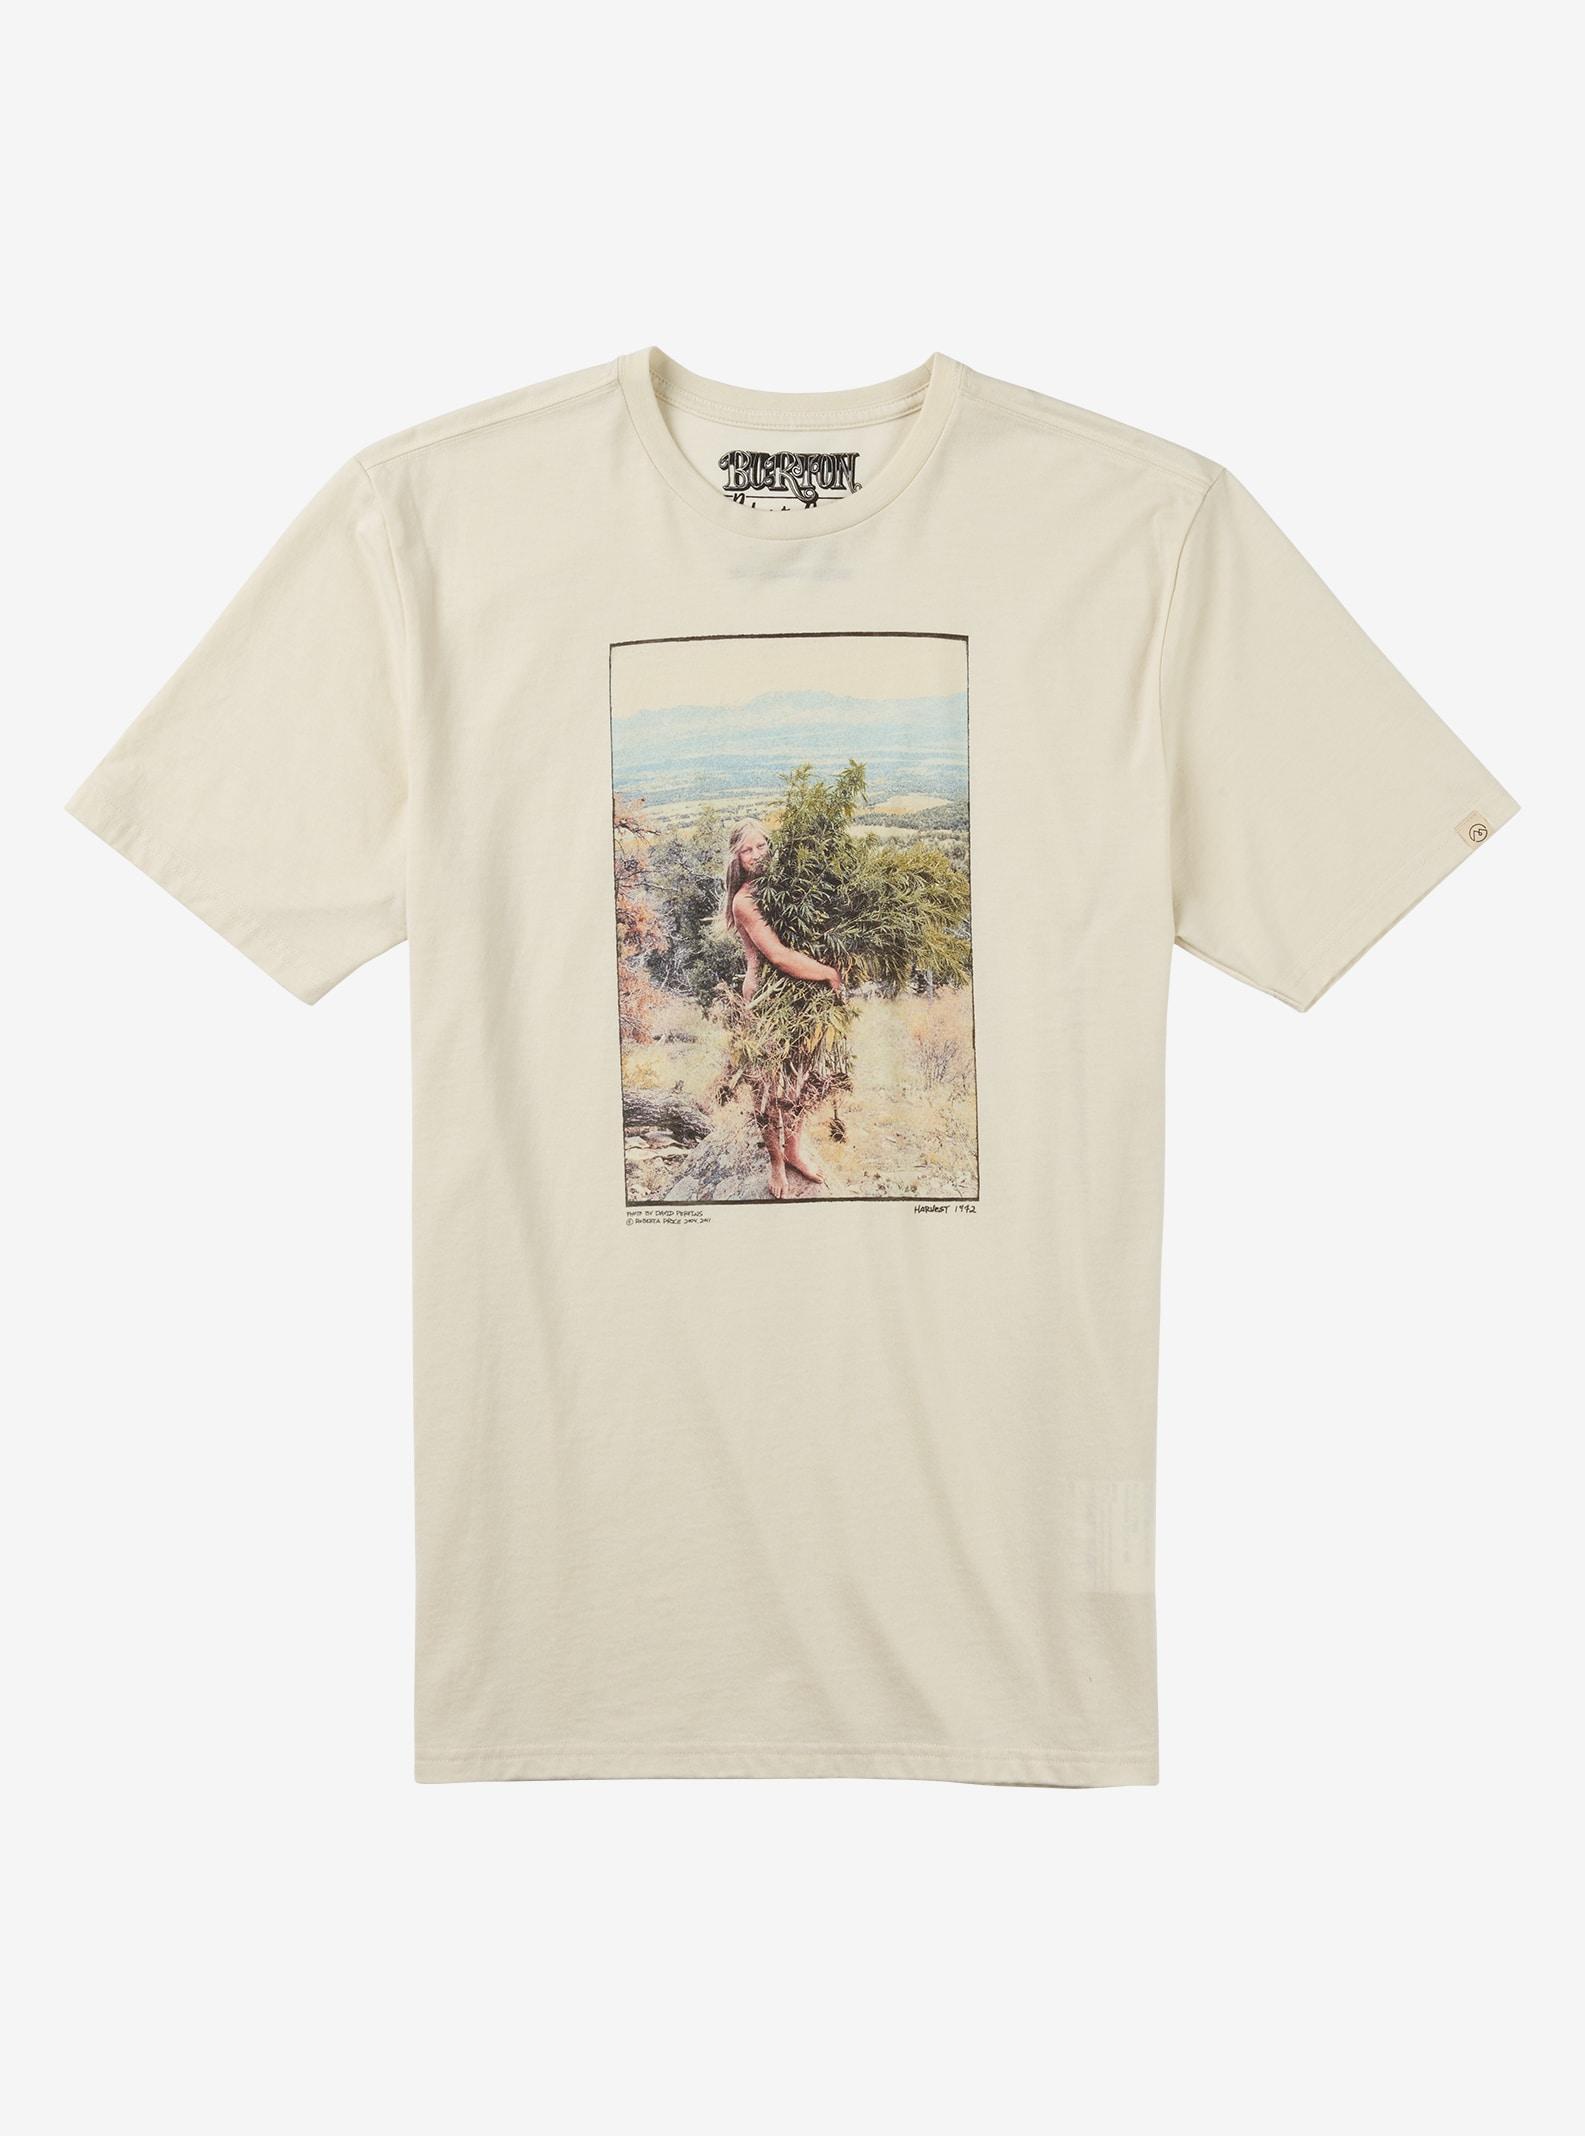 Burton Harvest Short Sleeve T Shirt shown in Vintage White